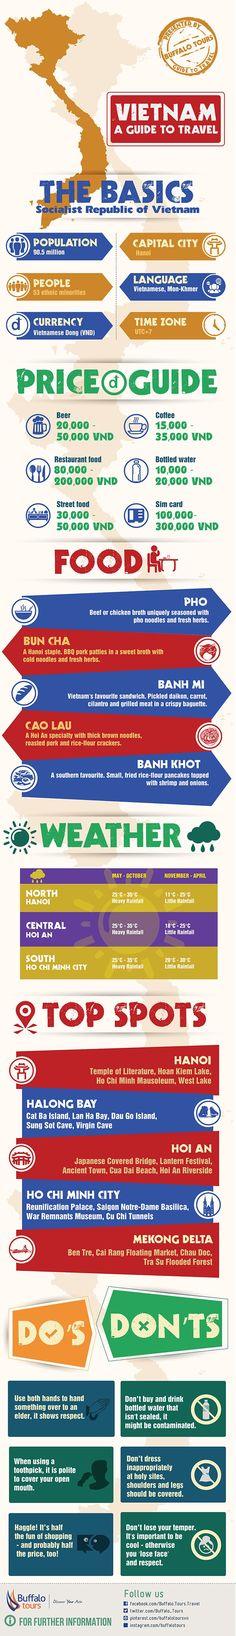 infographic Vietnam travel tips